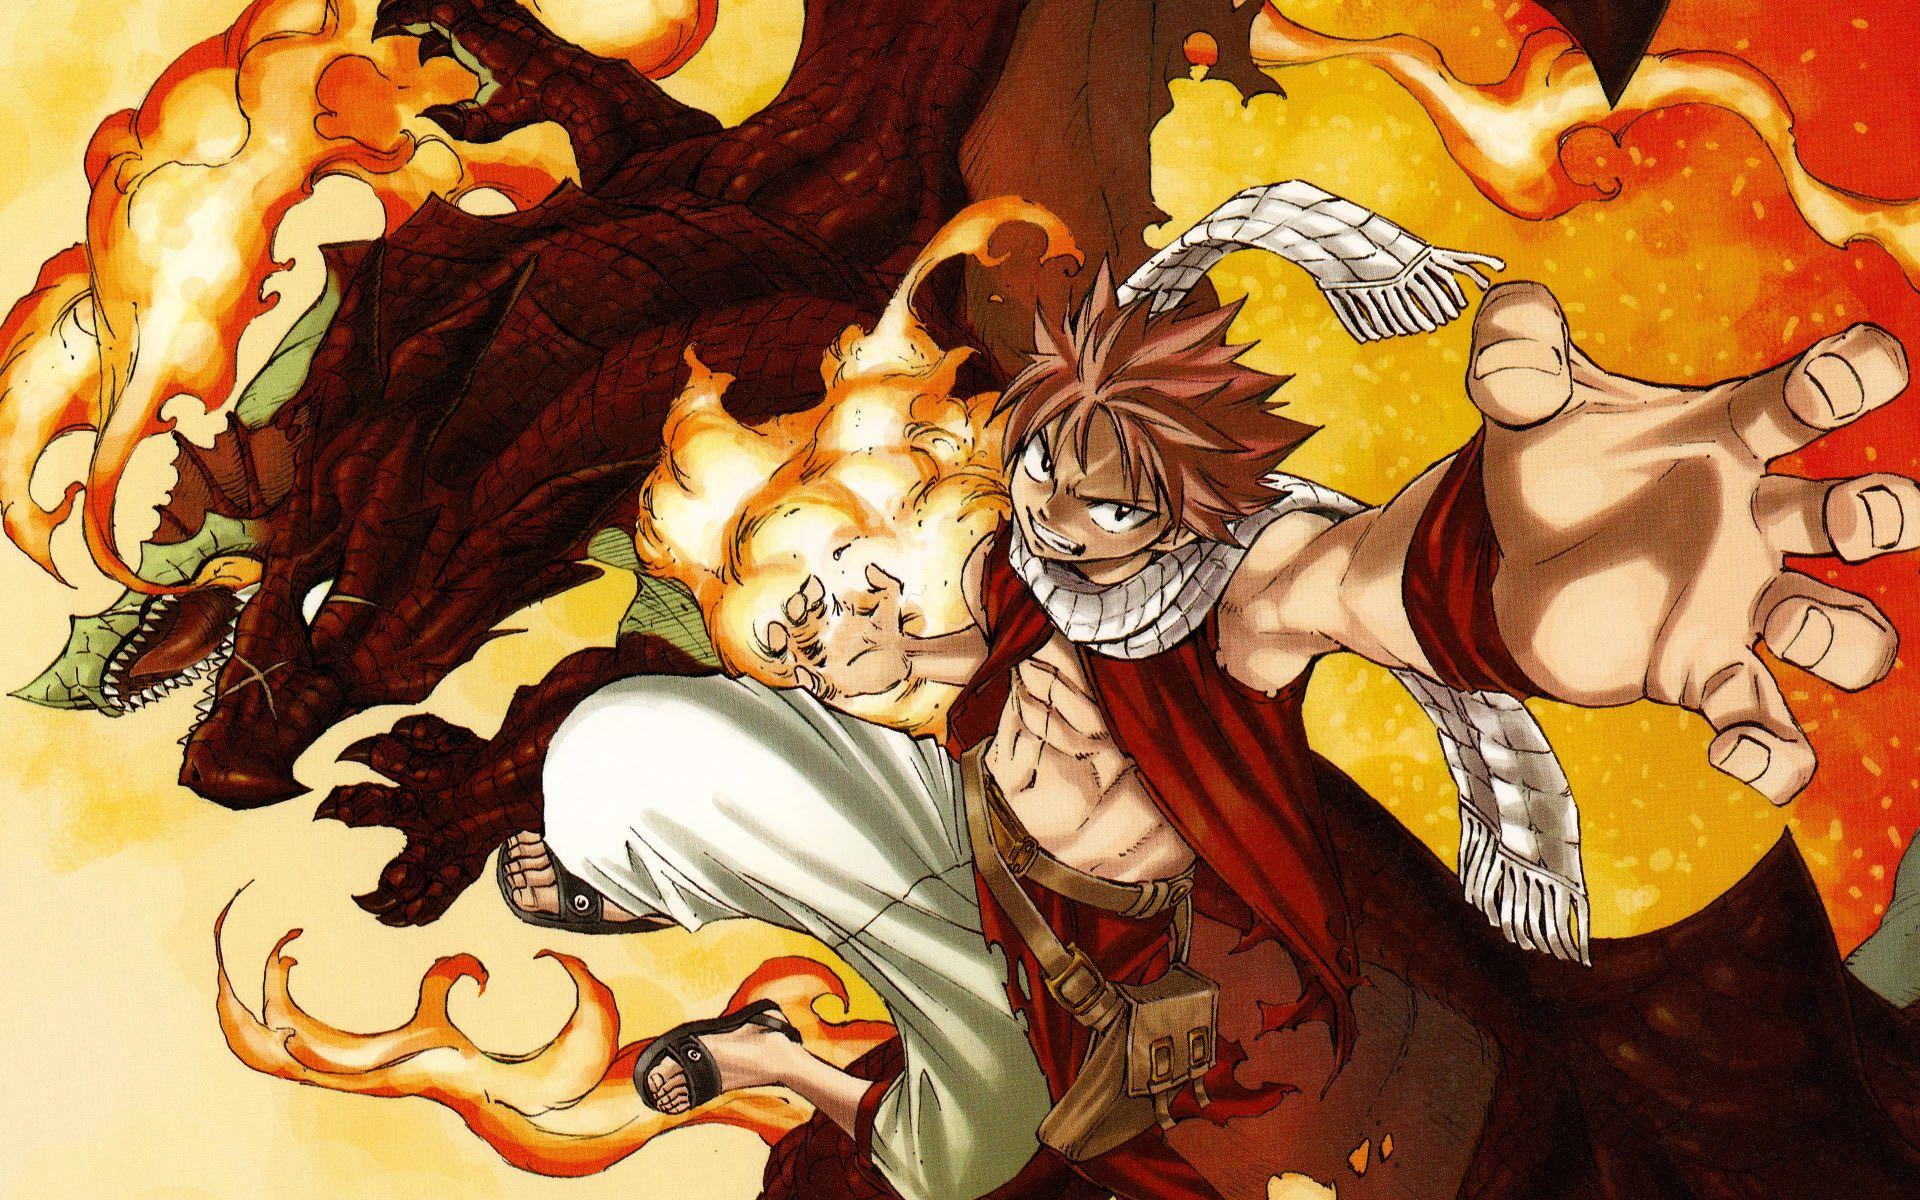 Natsu Dragneel Fairy Tail Wallpaper 2226 Idpict Com Fairy Tail Background Fairy Tail Anime Anime Wallpaper